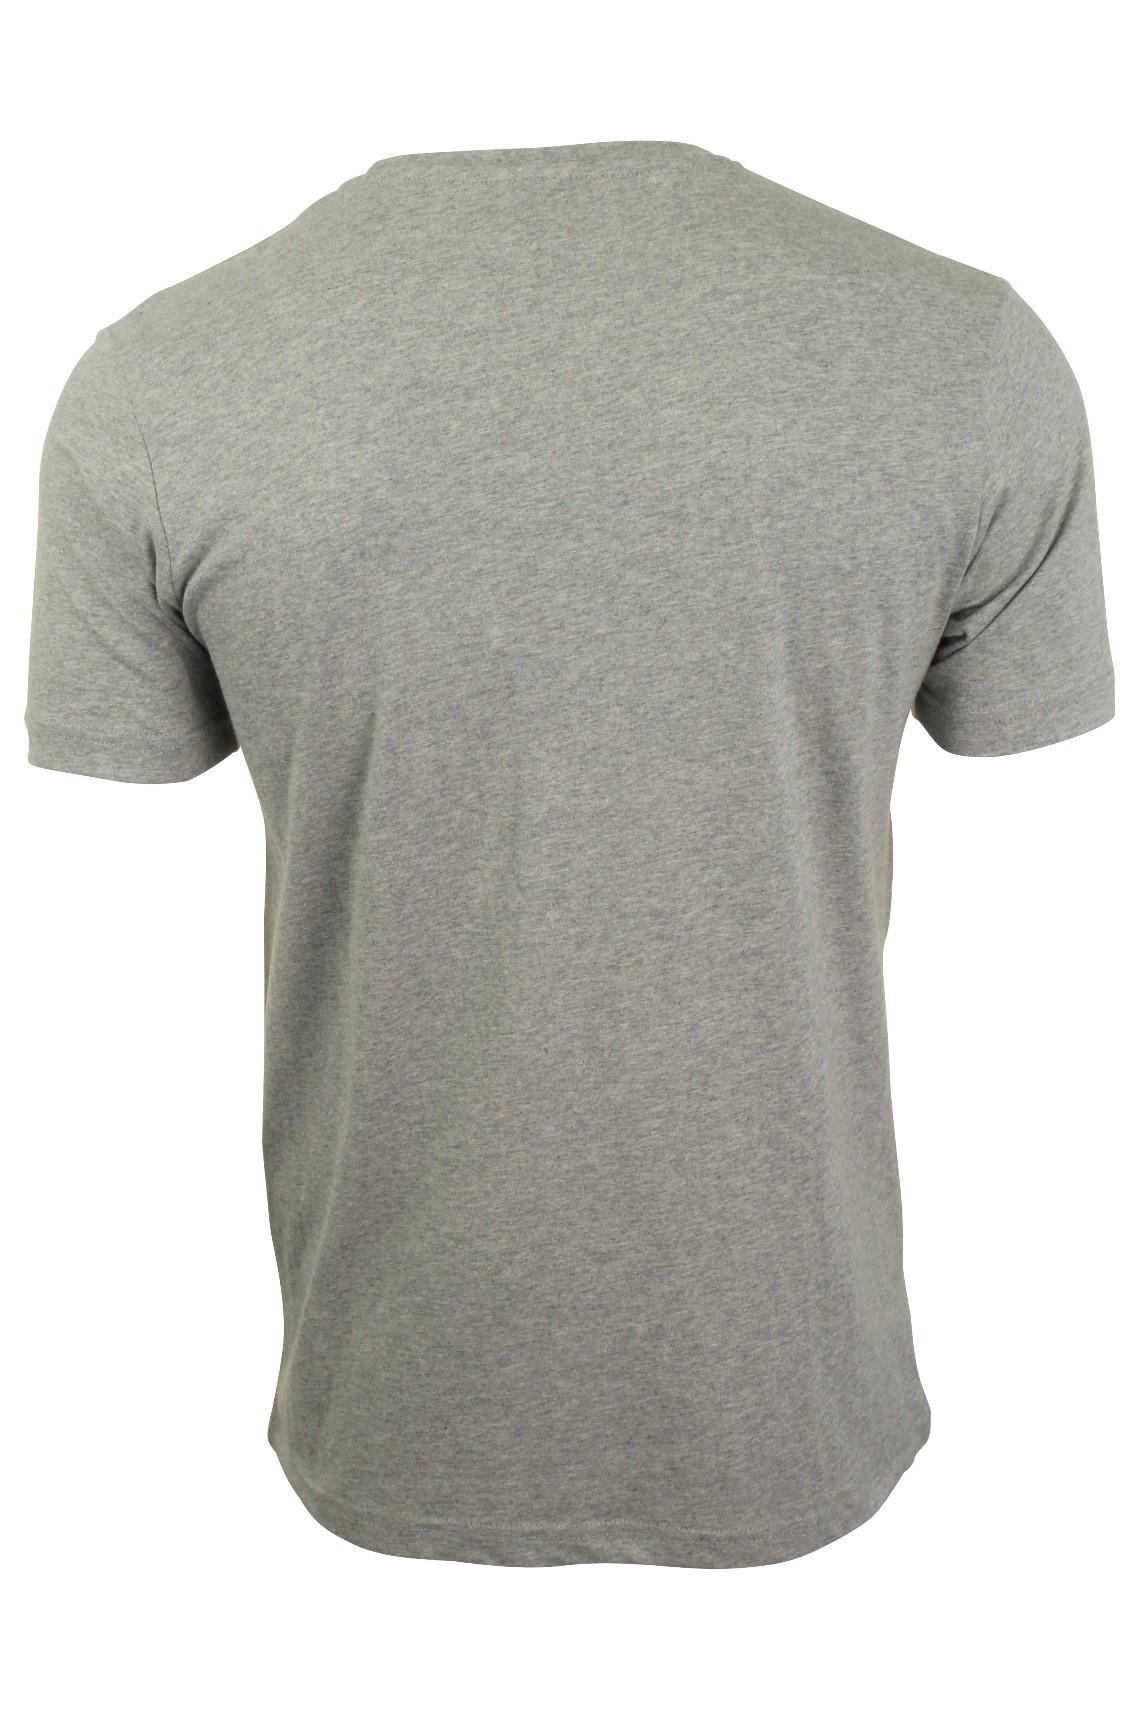 Para-Hombre-Ellesse-Camiseta-de-manga-corta-039-Canaletto-034 miniatura 8